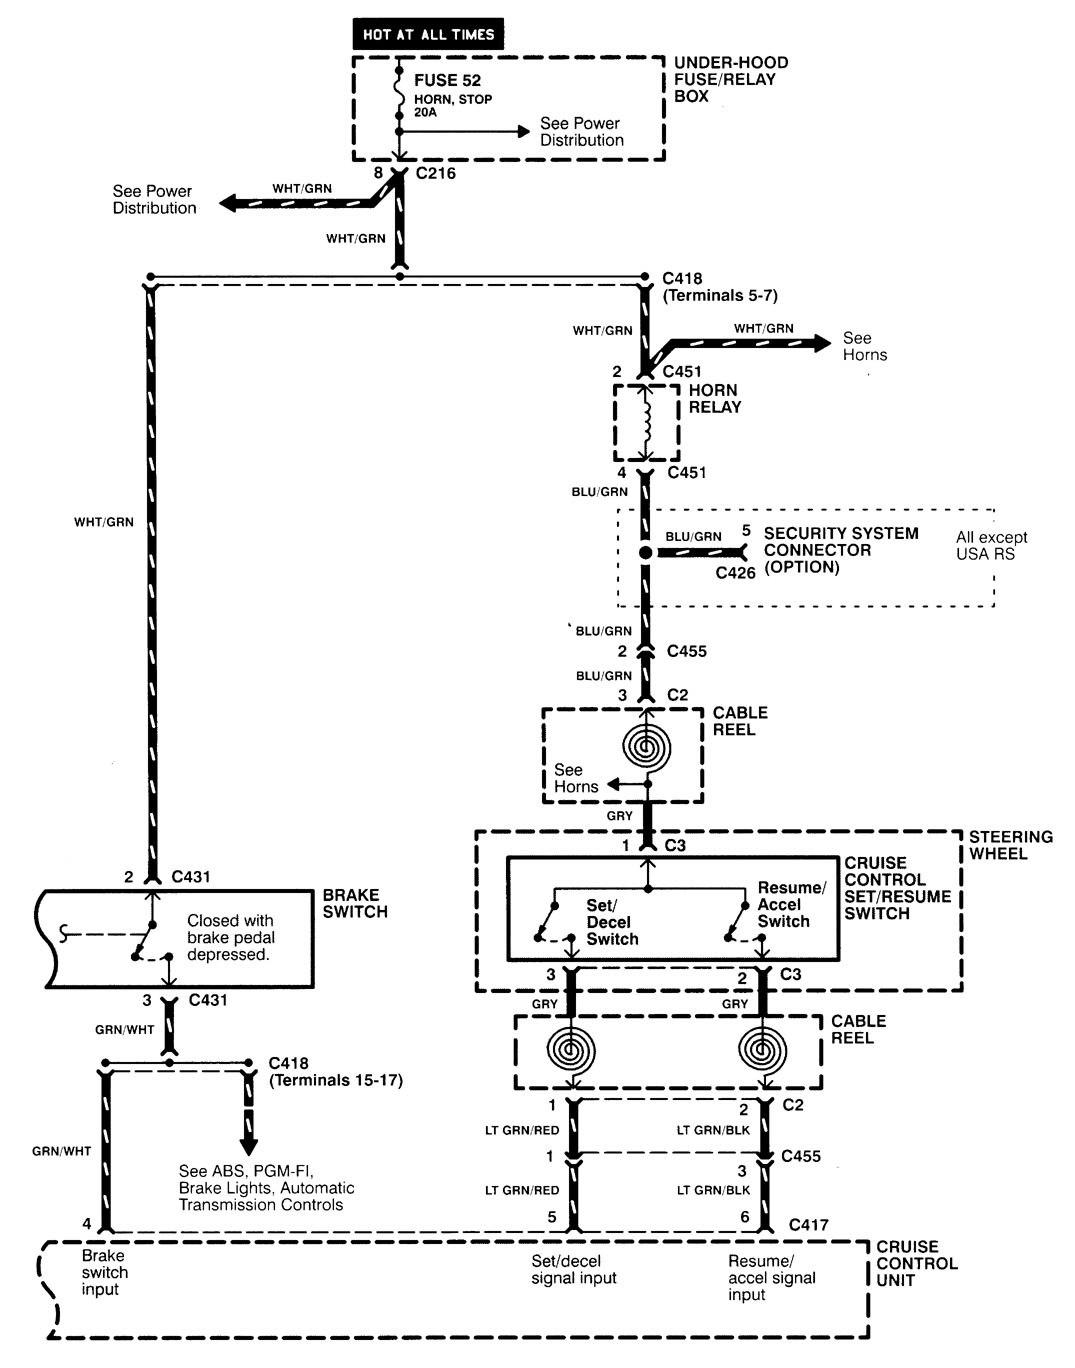 Acura Integra 1998 2001 Wiring Diagrams Speed Control 94 Cruise Diagram Part 2